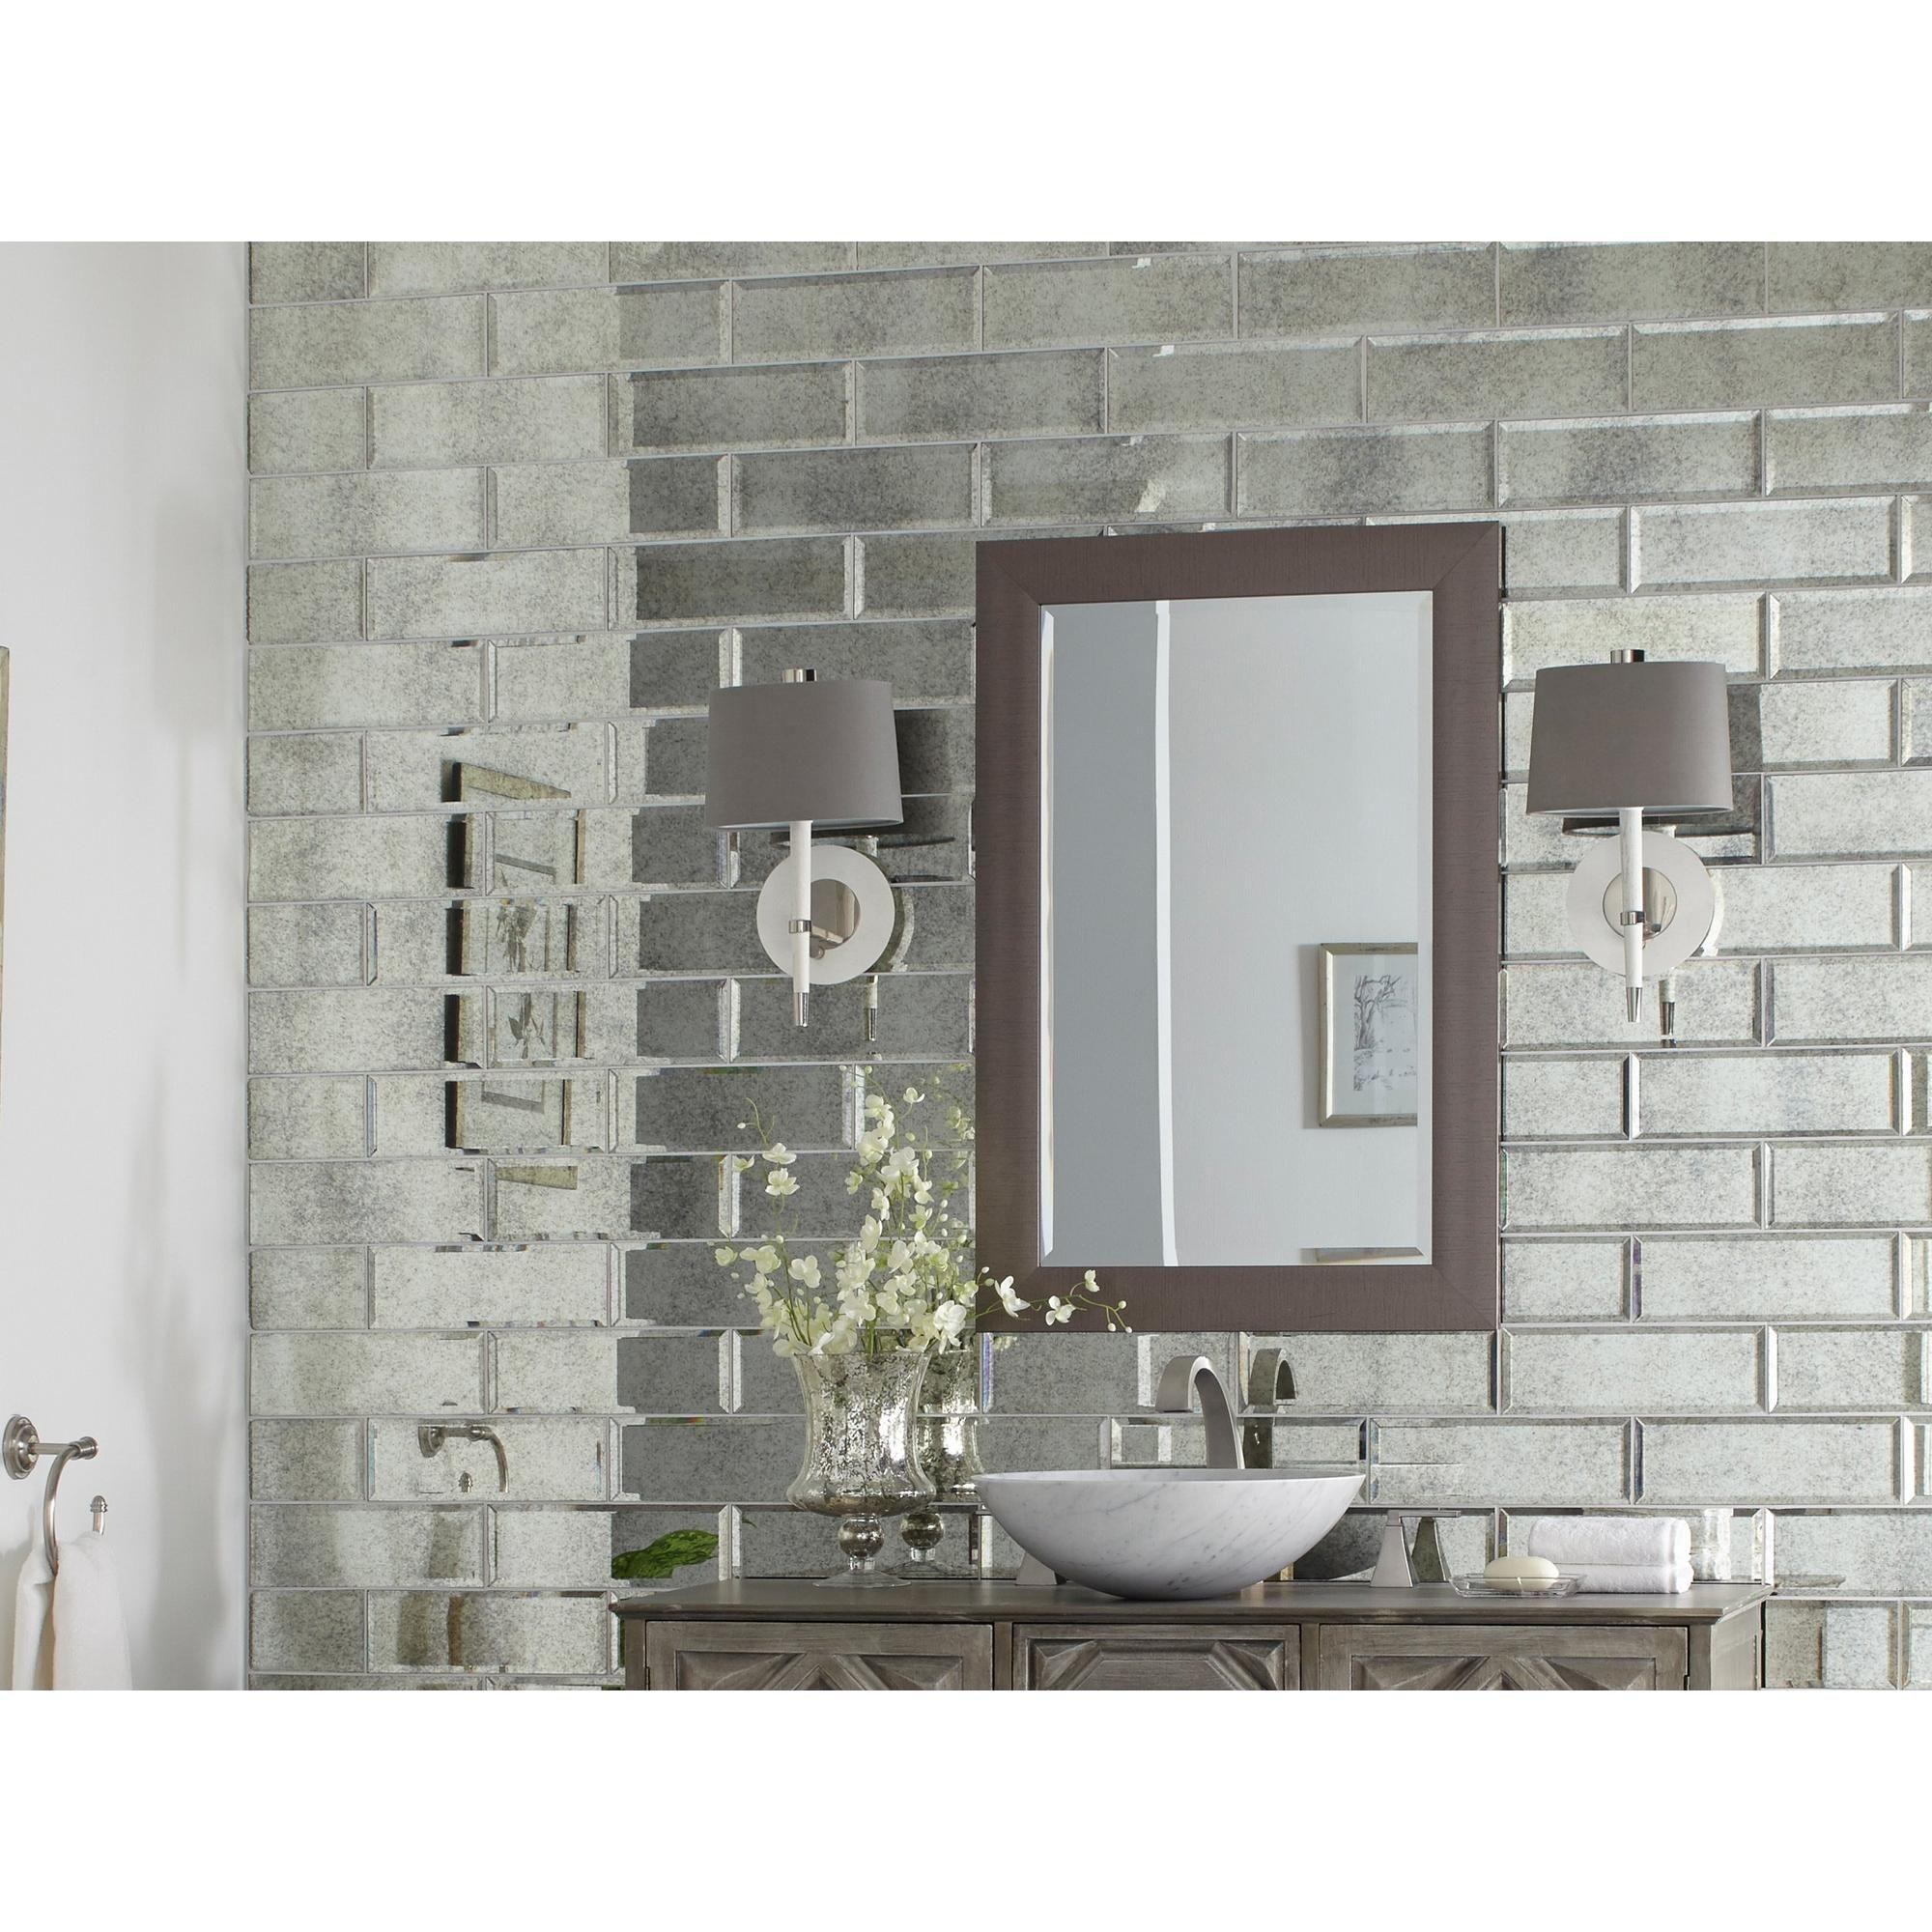 Antique mirror glass tile antique mirror glass decorative accents antique mirror glass tile dailygadgetfo Gallery